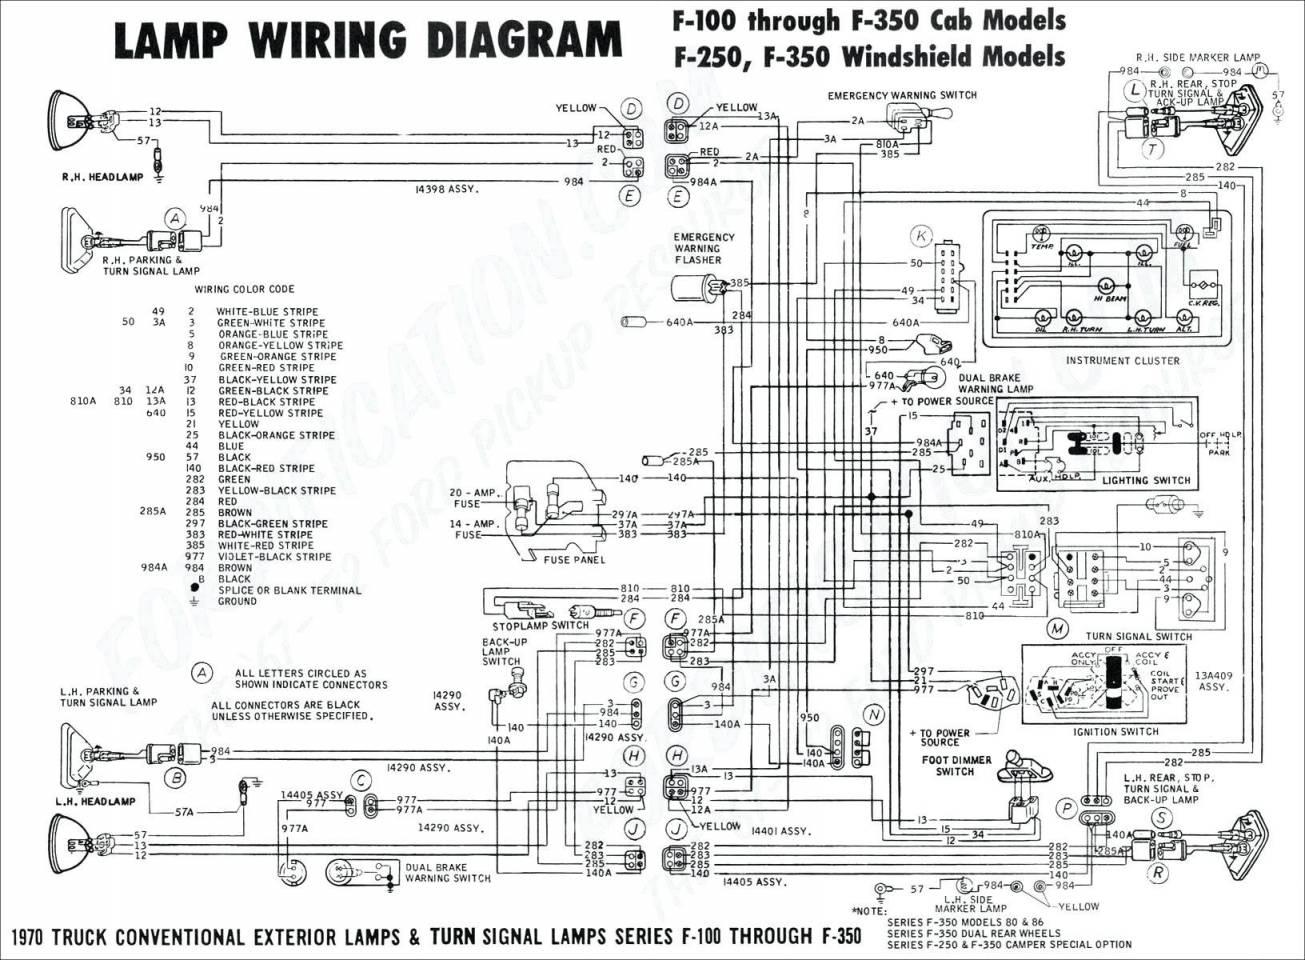 Purpose Of Slip Rings Beautiful Wind Turbine Slip Ring 8 Circuits - Wind Turbine Wiring Diagram